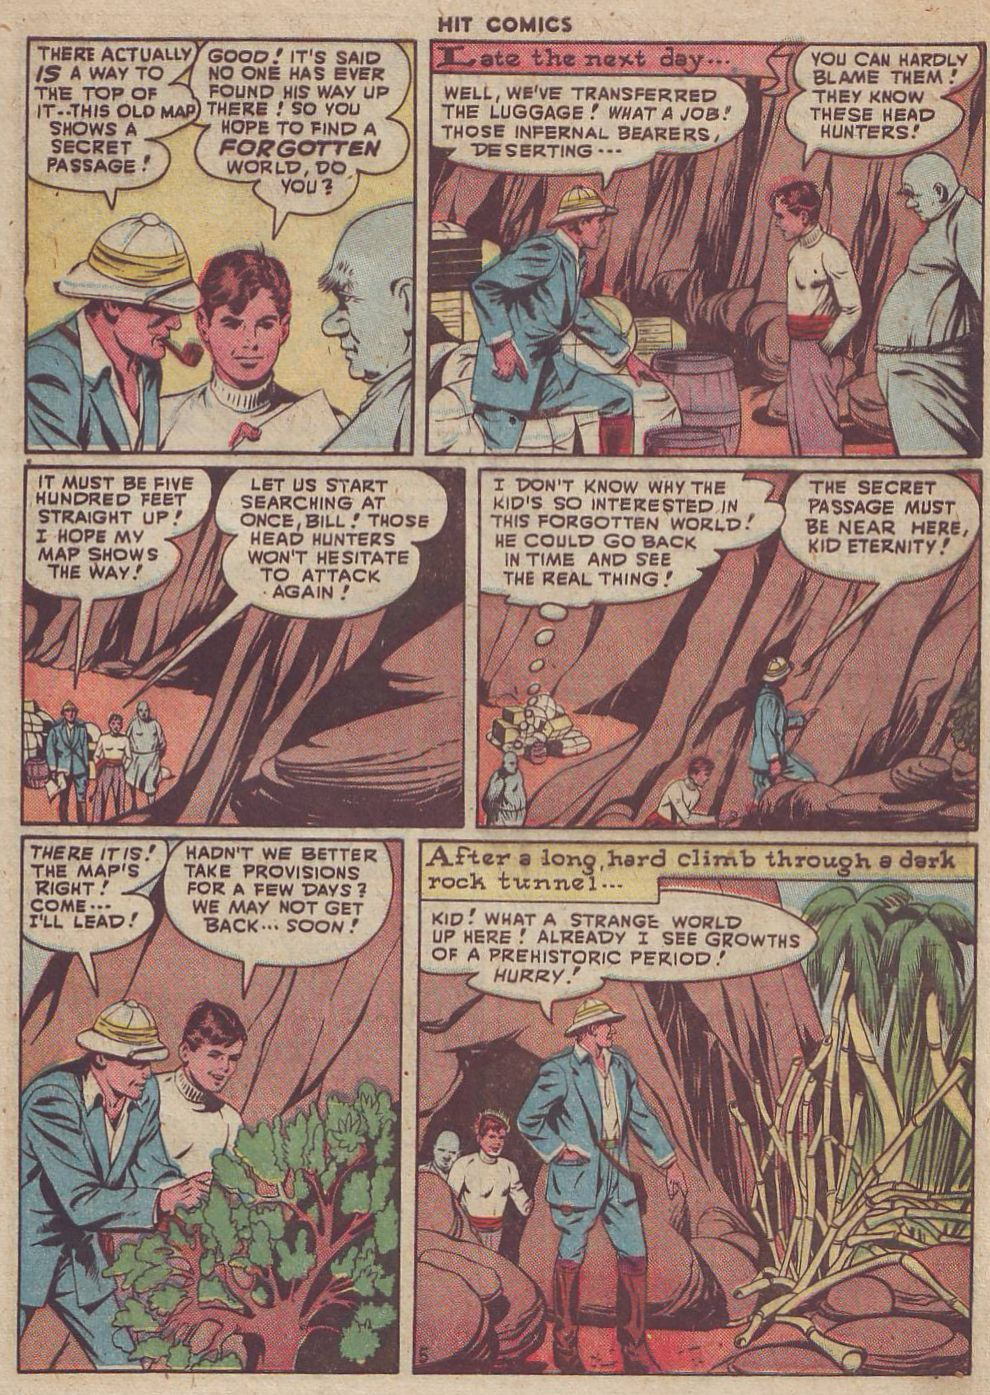 Read online Hit Comics comic -  Issue #51 - 7